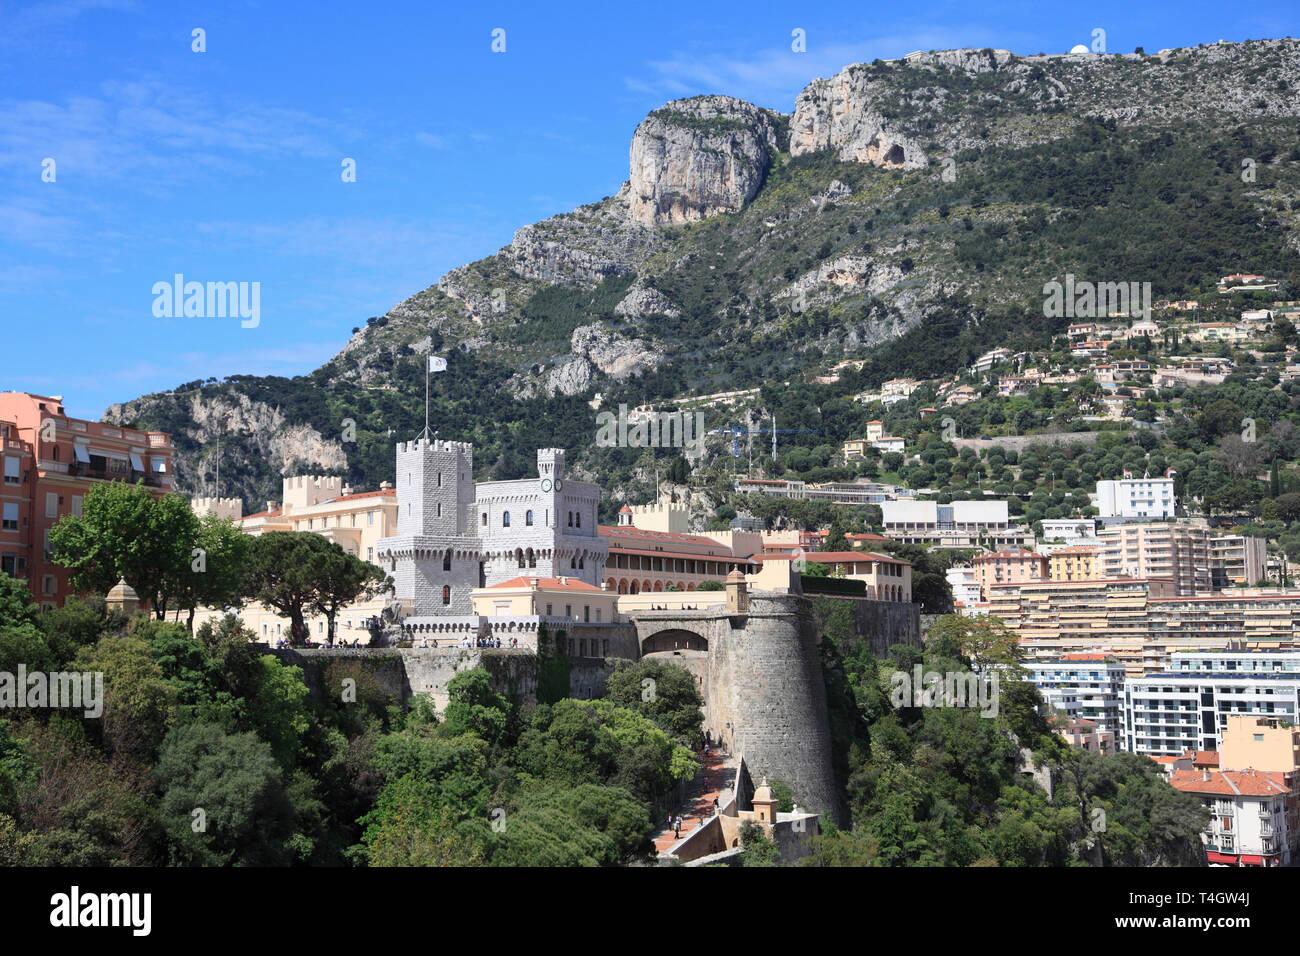 Princes of Grimaldi Palace, Royal Palace, Le Rocher, The Rock, Monaco, Cote d Azur, Mediterranean, Europe - Stock Image